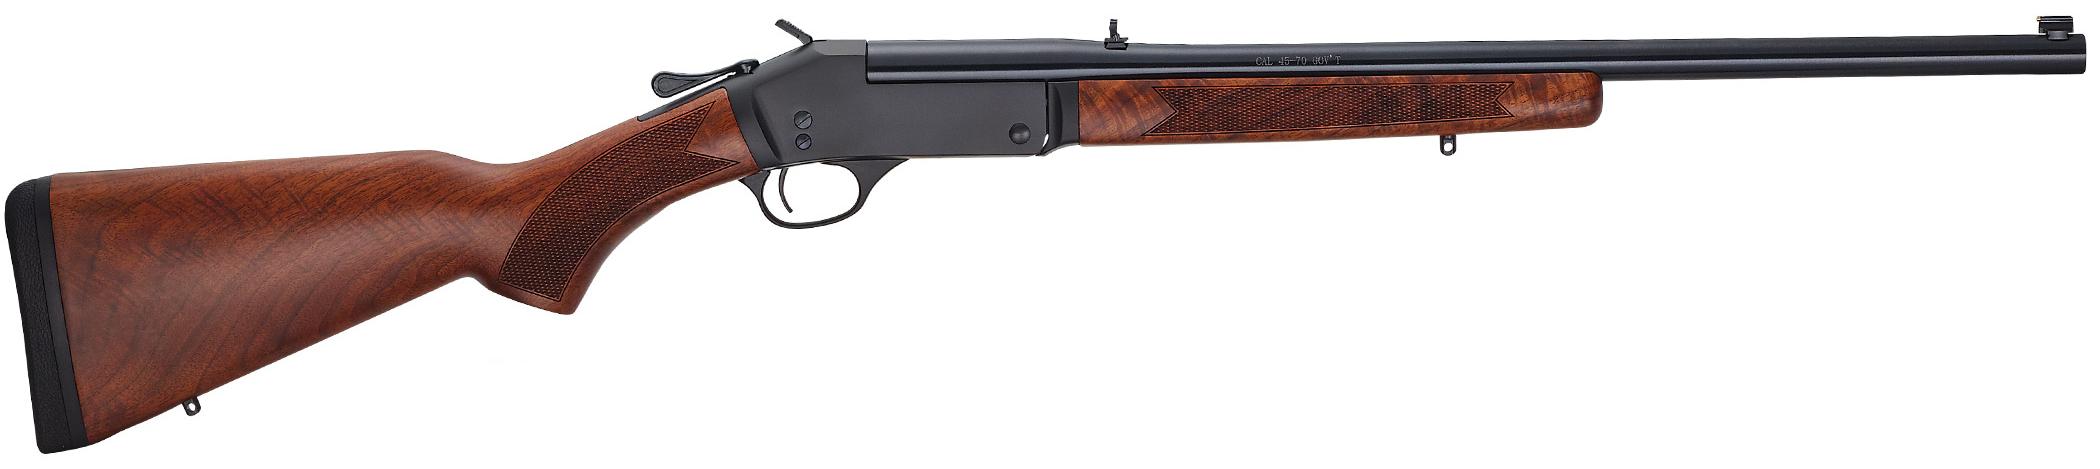 Henry Single Shot Rifles